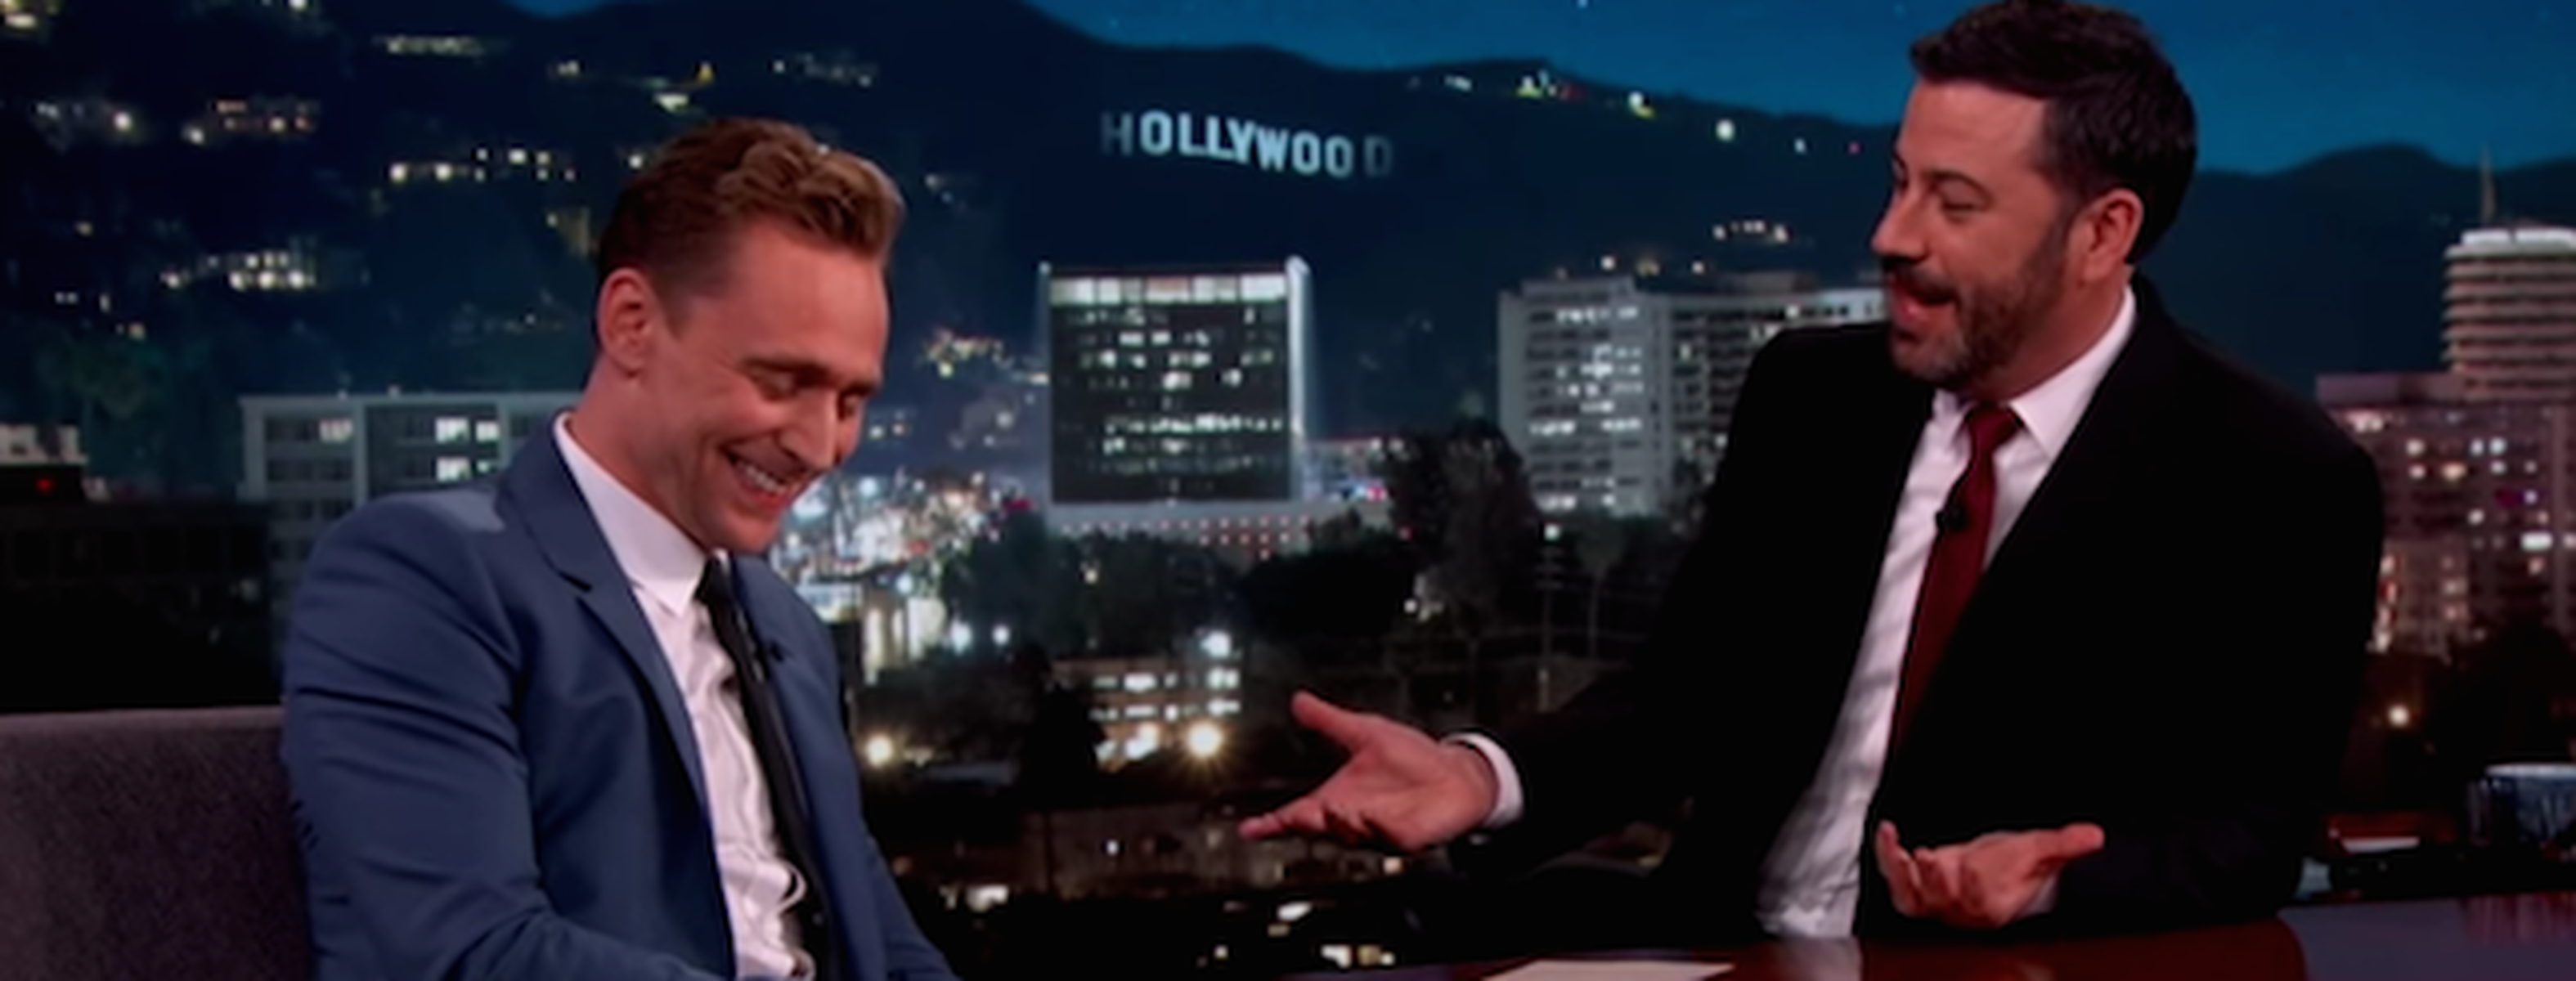 Watch Tom Hiddleston Yodels For Jimmy Kimmel